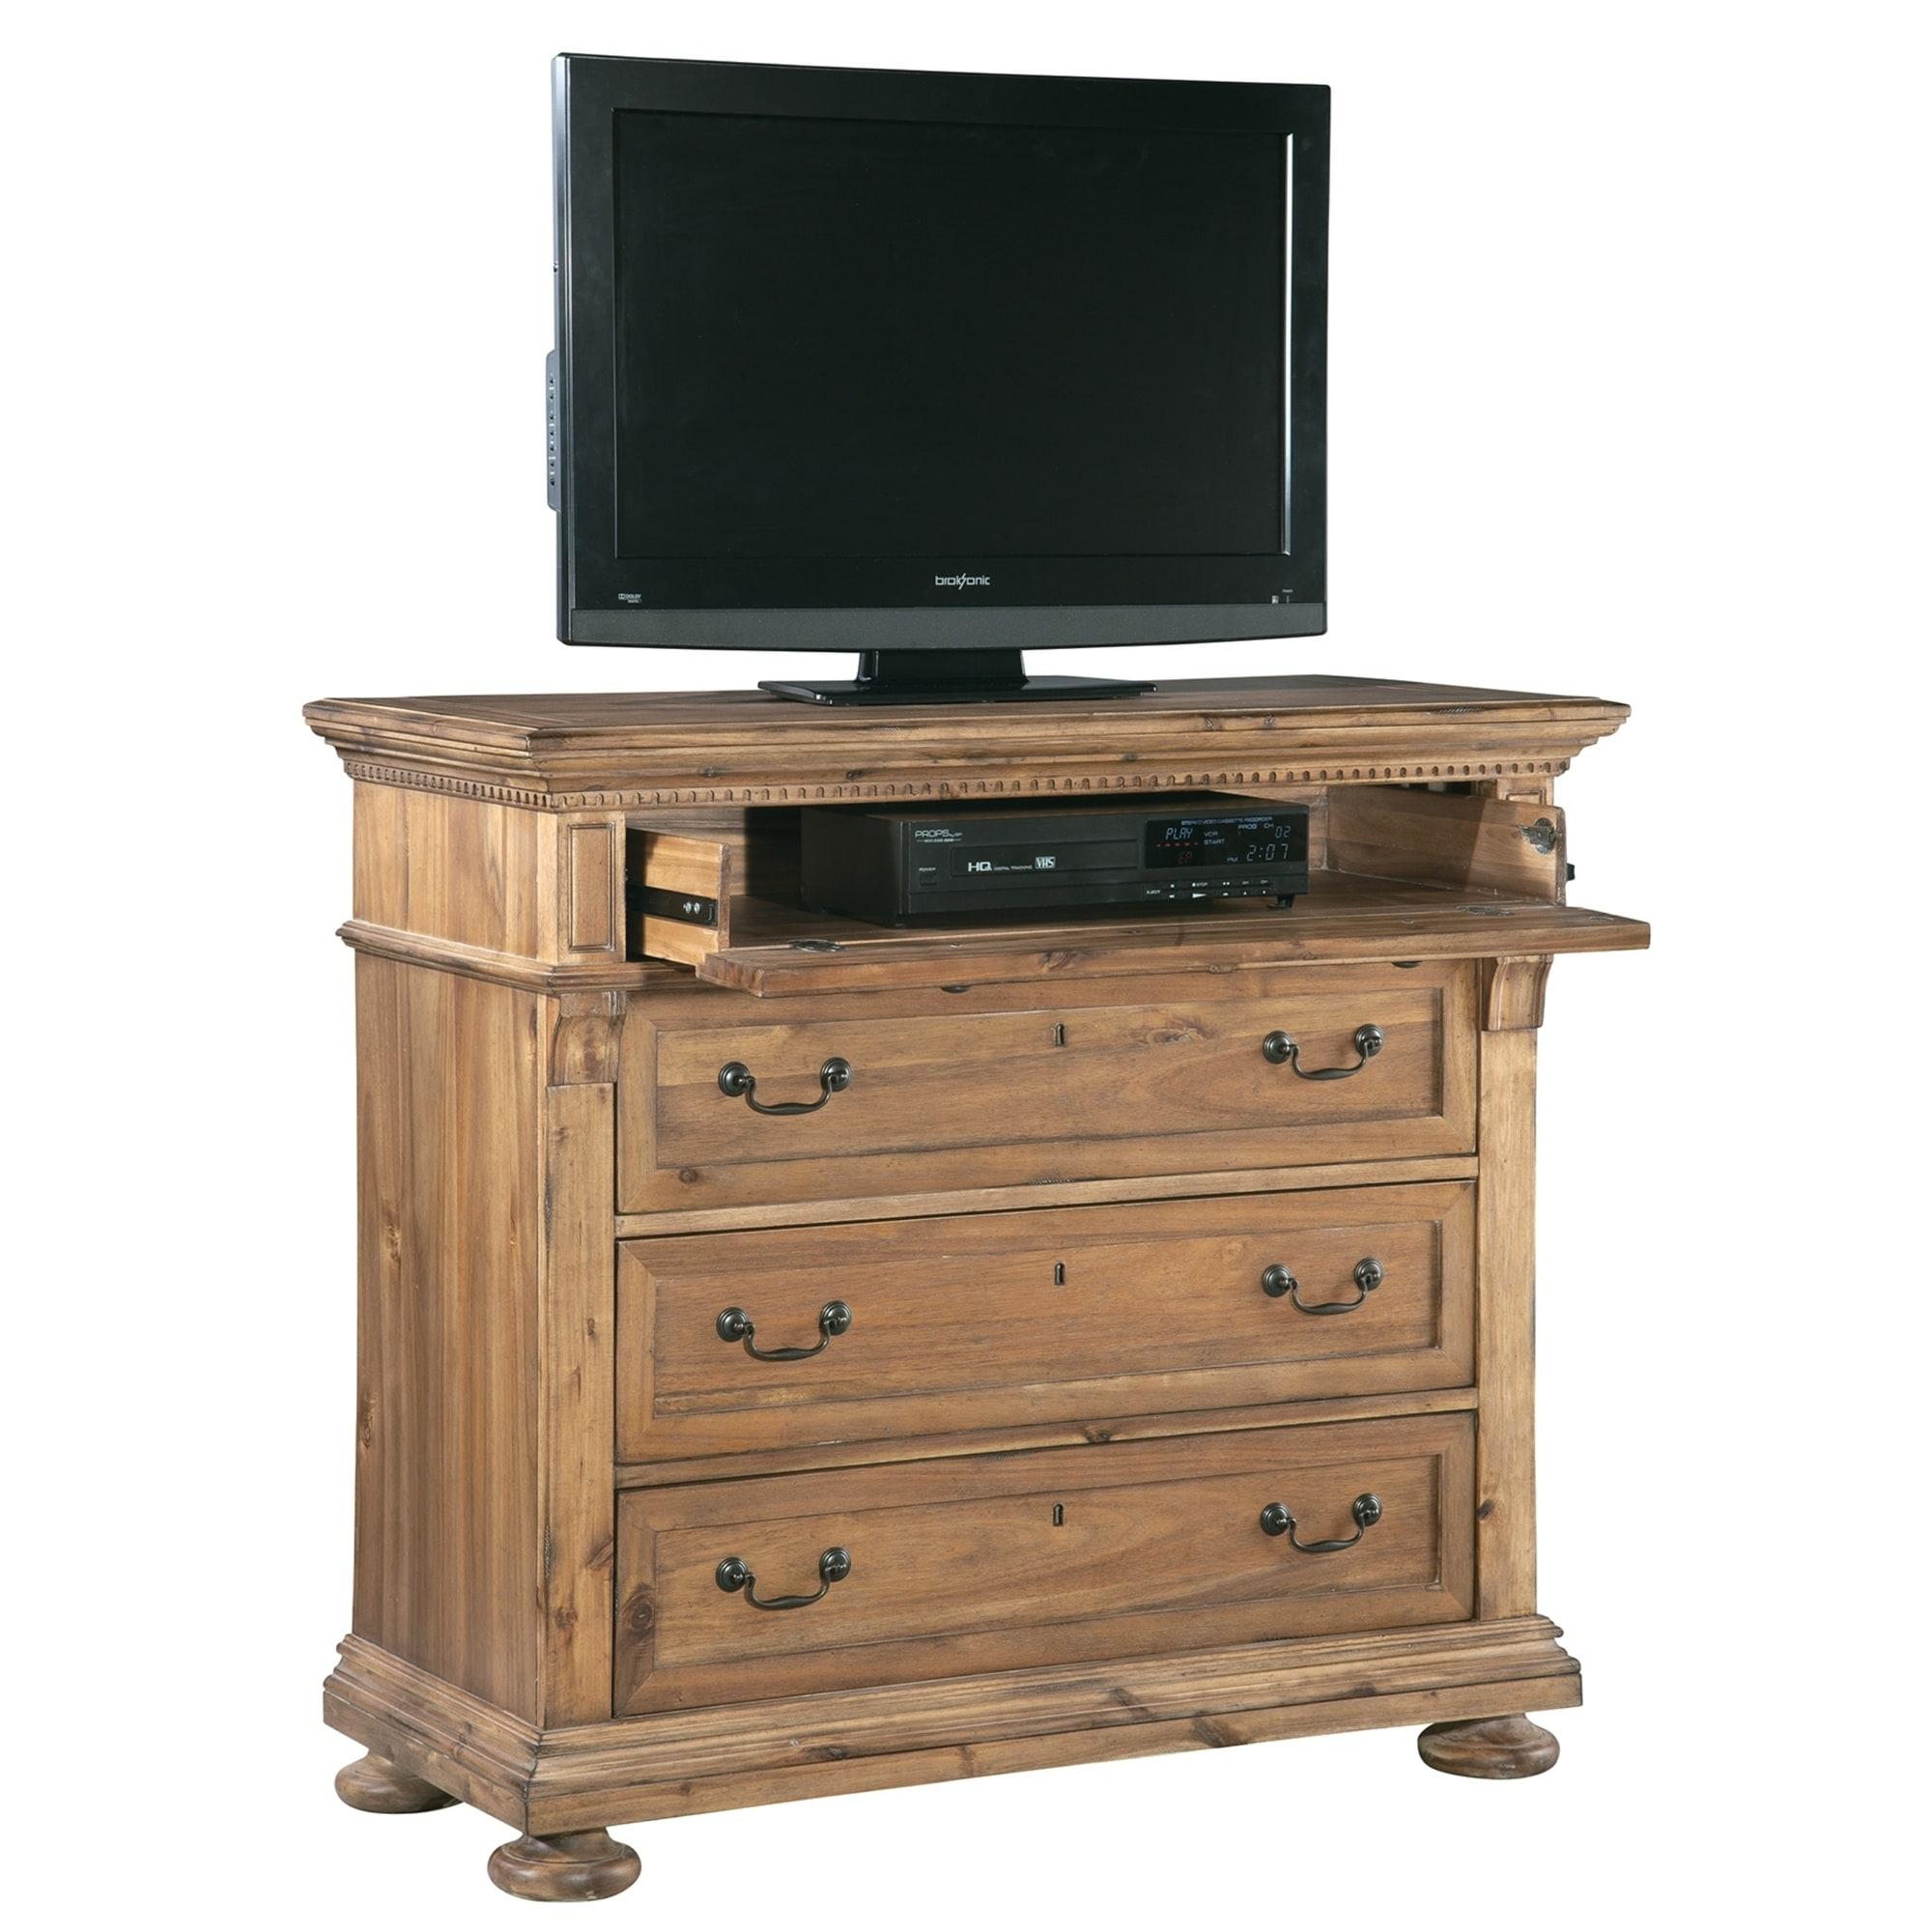 Shop wellington hall brown acacia wood veneer media bedroom dresser free shipping today overstock com 24229737